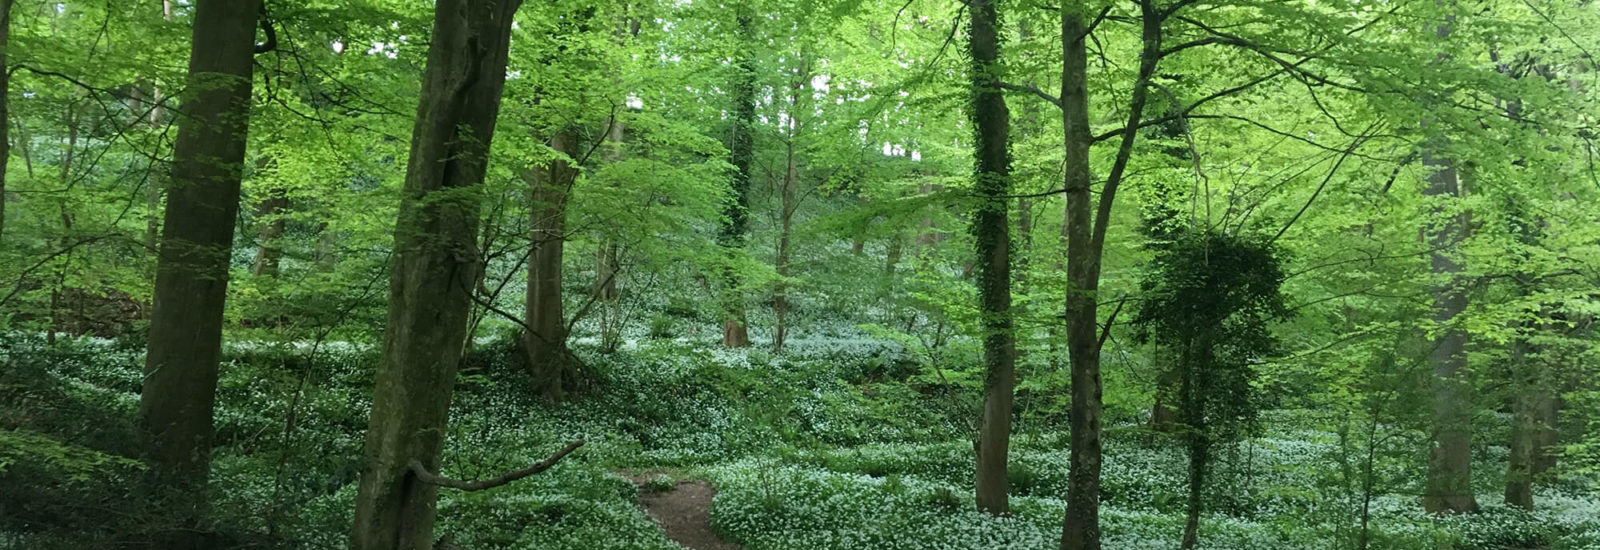 Image of West Tanpit Wood